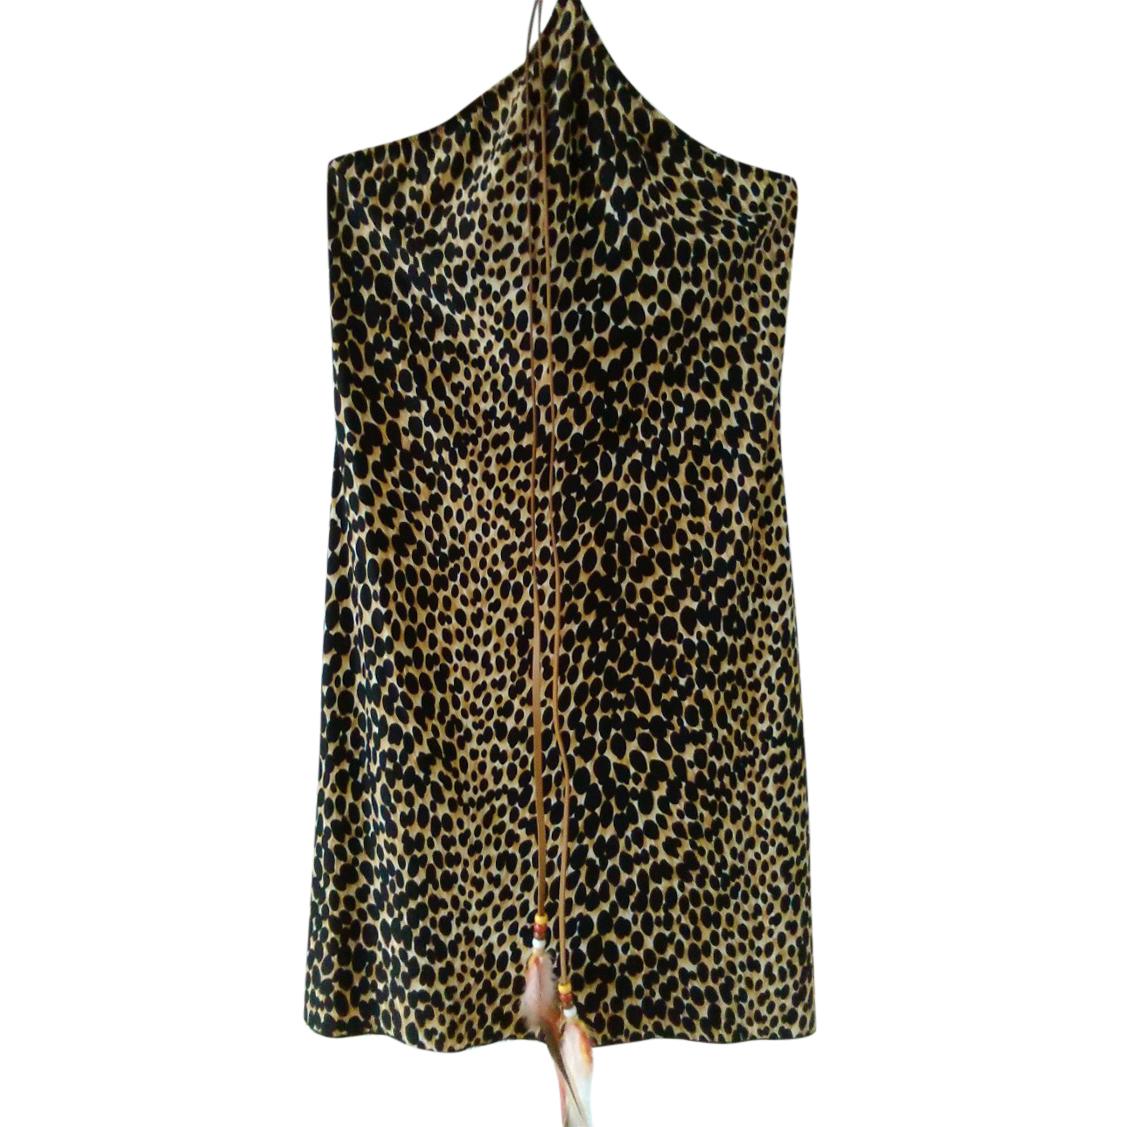 Dolce & Gabbana Beachwear Leopard Print Cover-Up